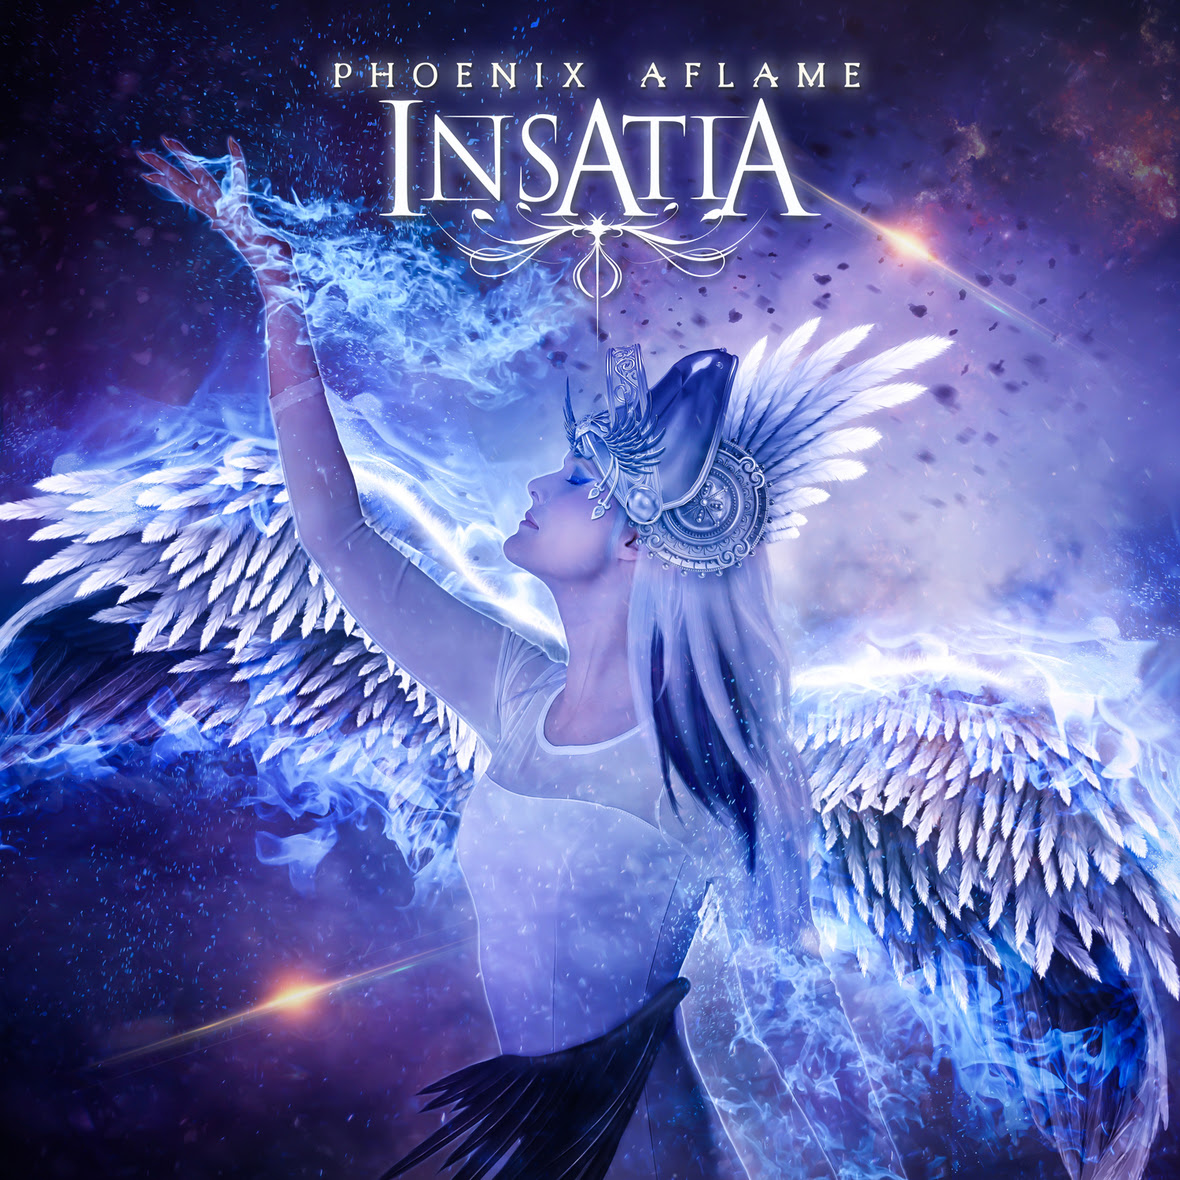 Insatia - Phoenix Aflame 1500 x 1500